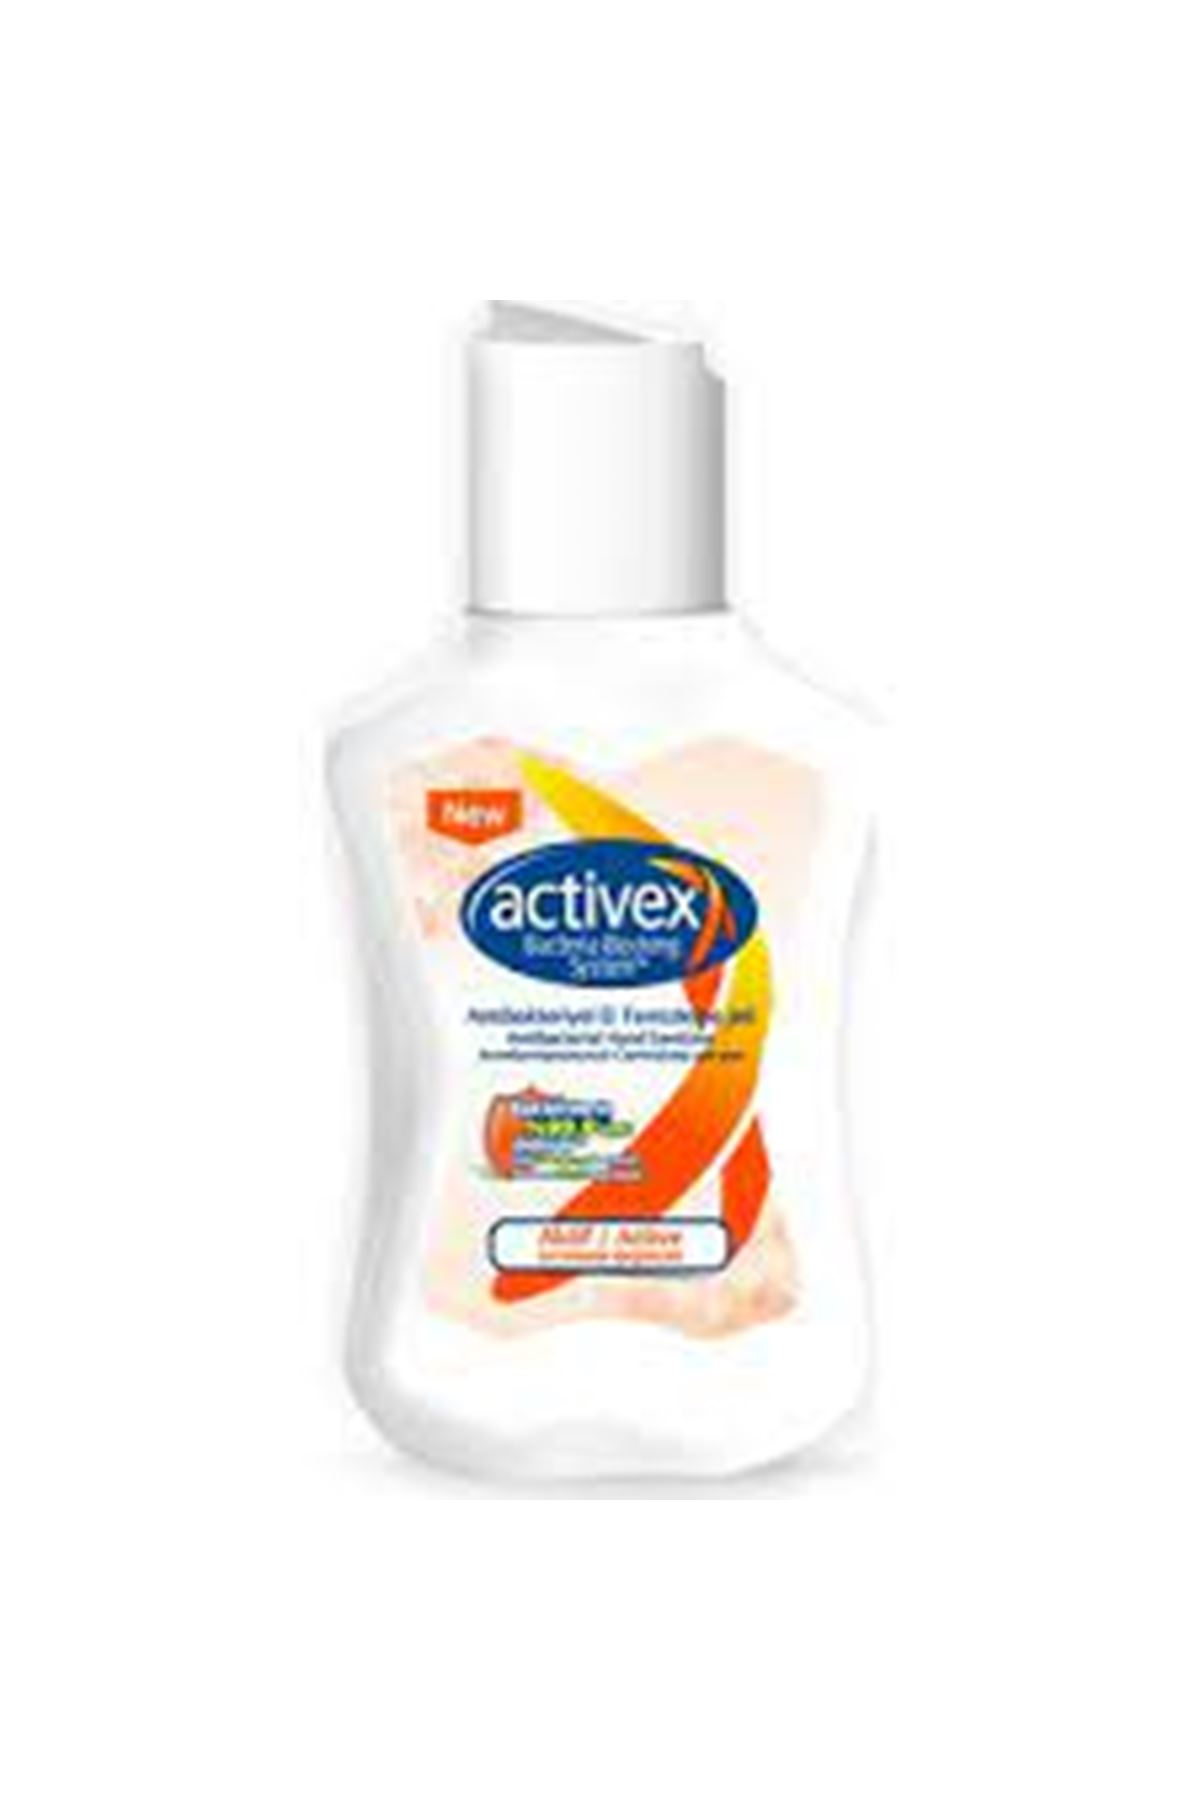 Activex Antibakteriyel El Temizleme Jeli Aktif 100ml